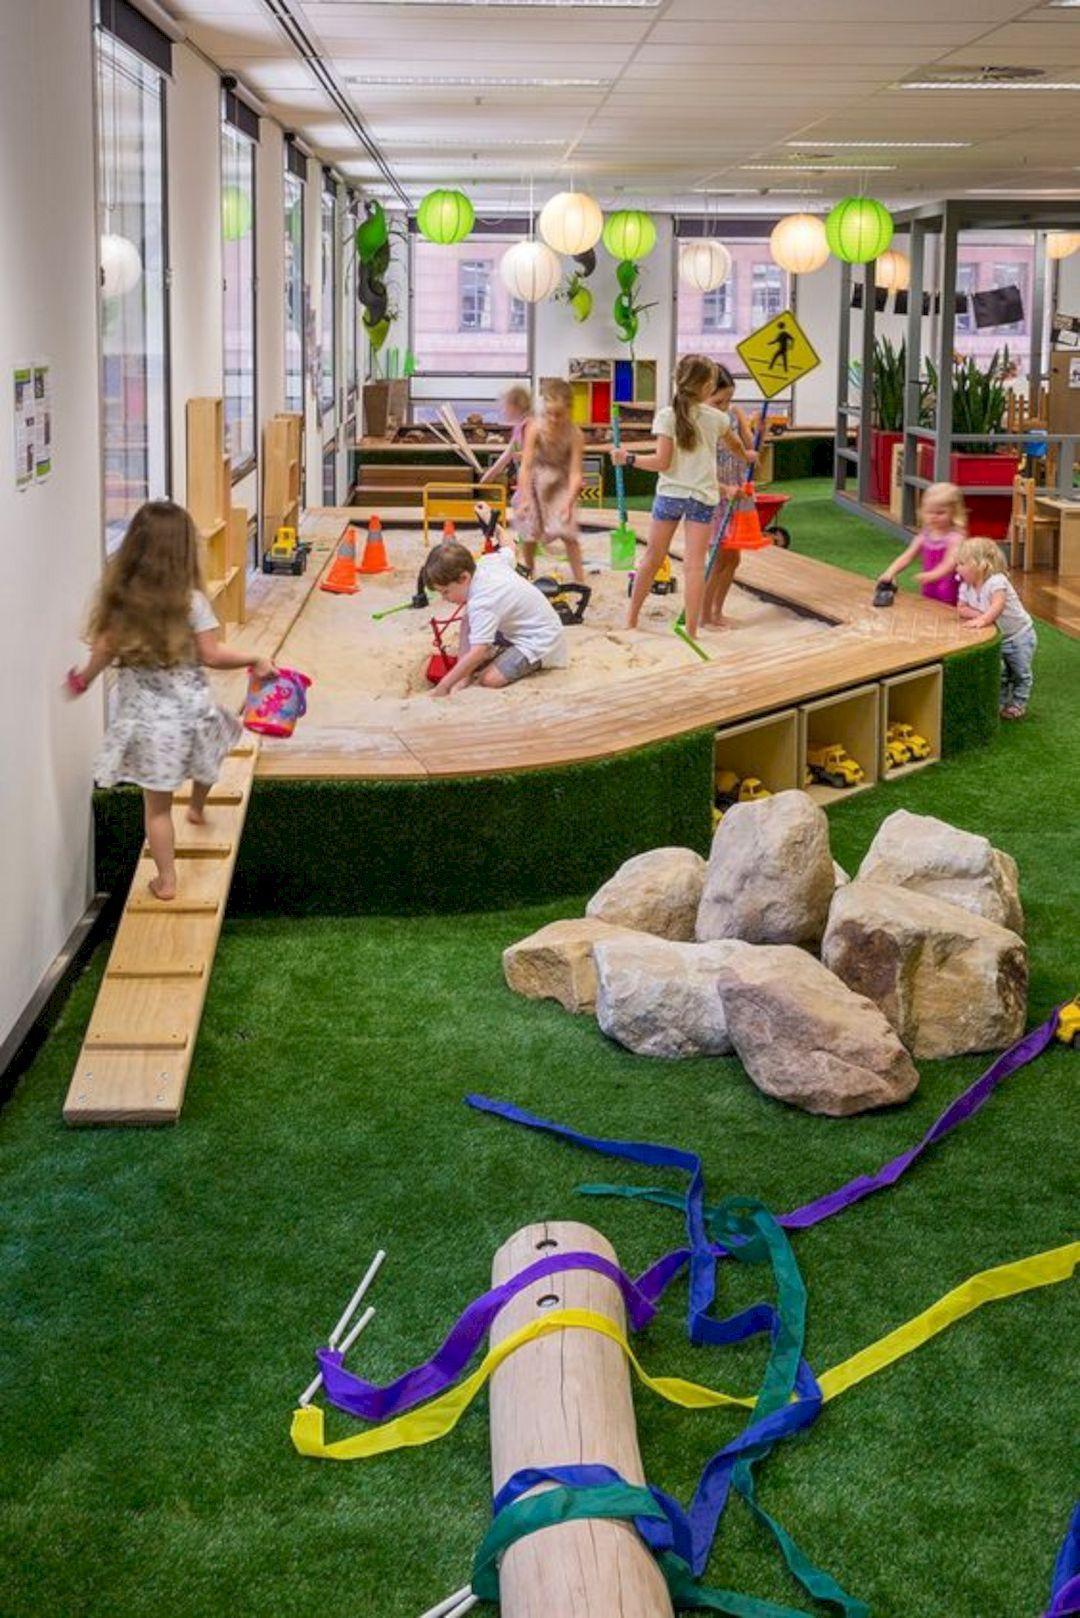 16 Play School Interior Design Ideas | Kid kid, Modern interiors and ...